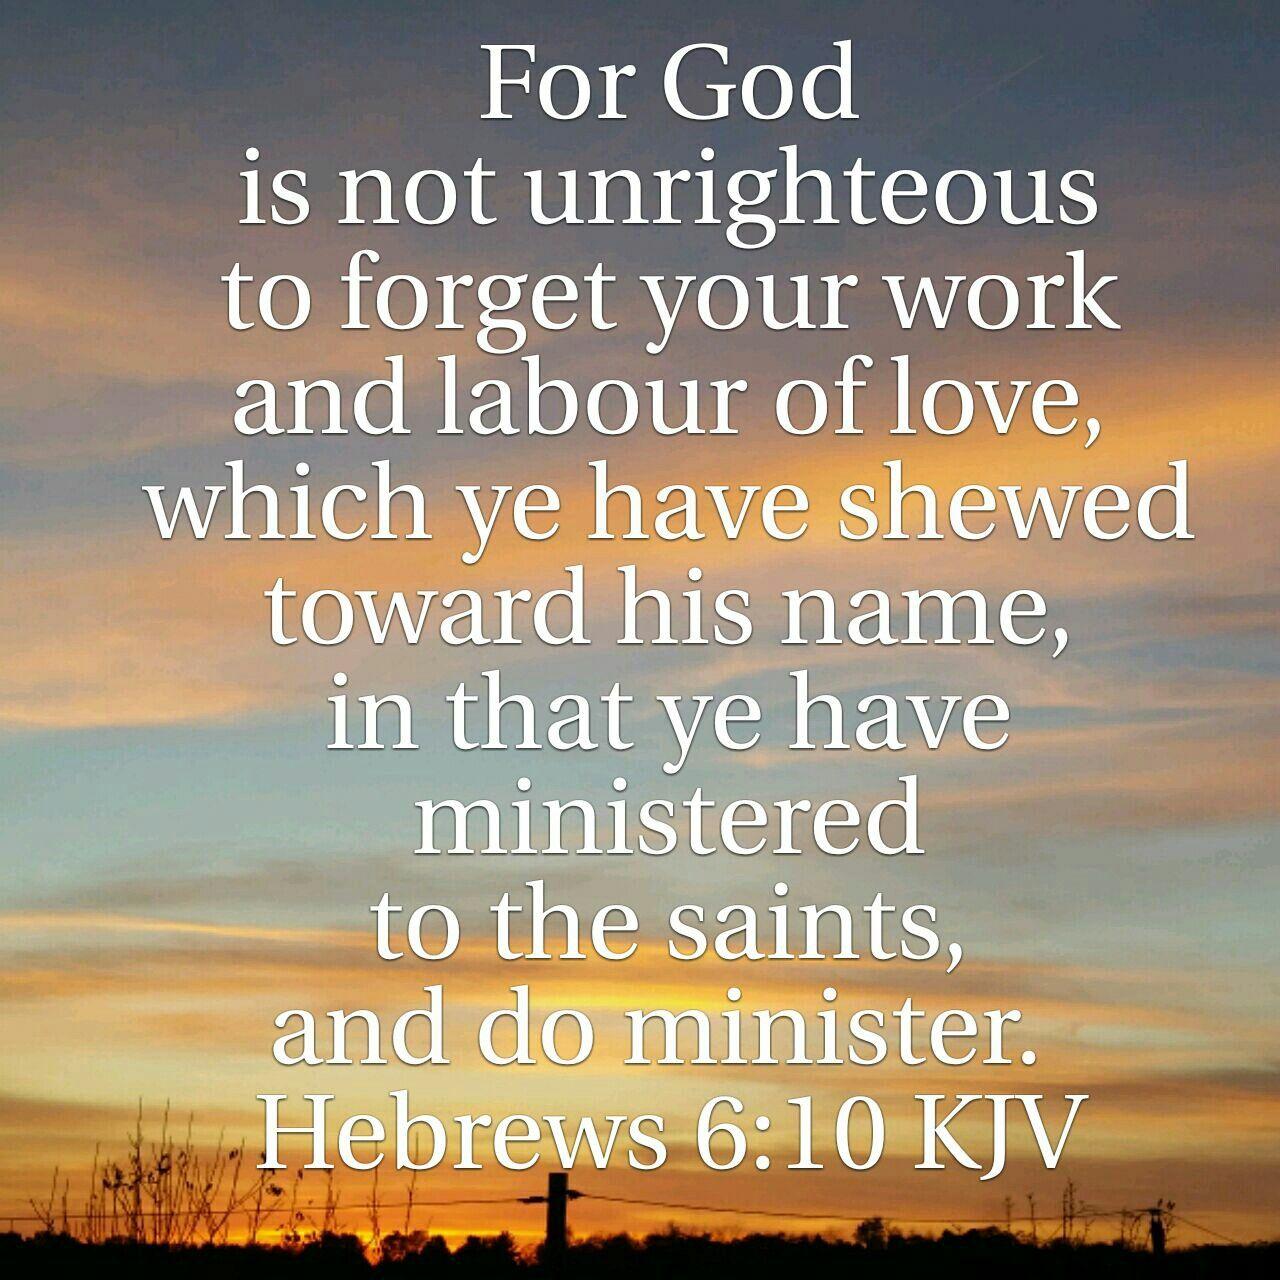 Hebrews 6:10 KJV | Faith verses, Bible quotes kjv, Christian verses